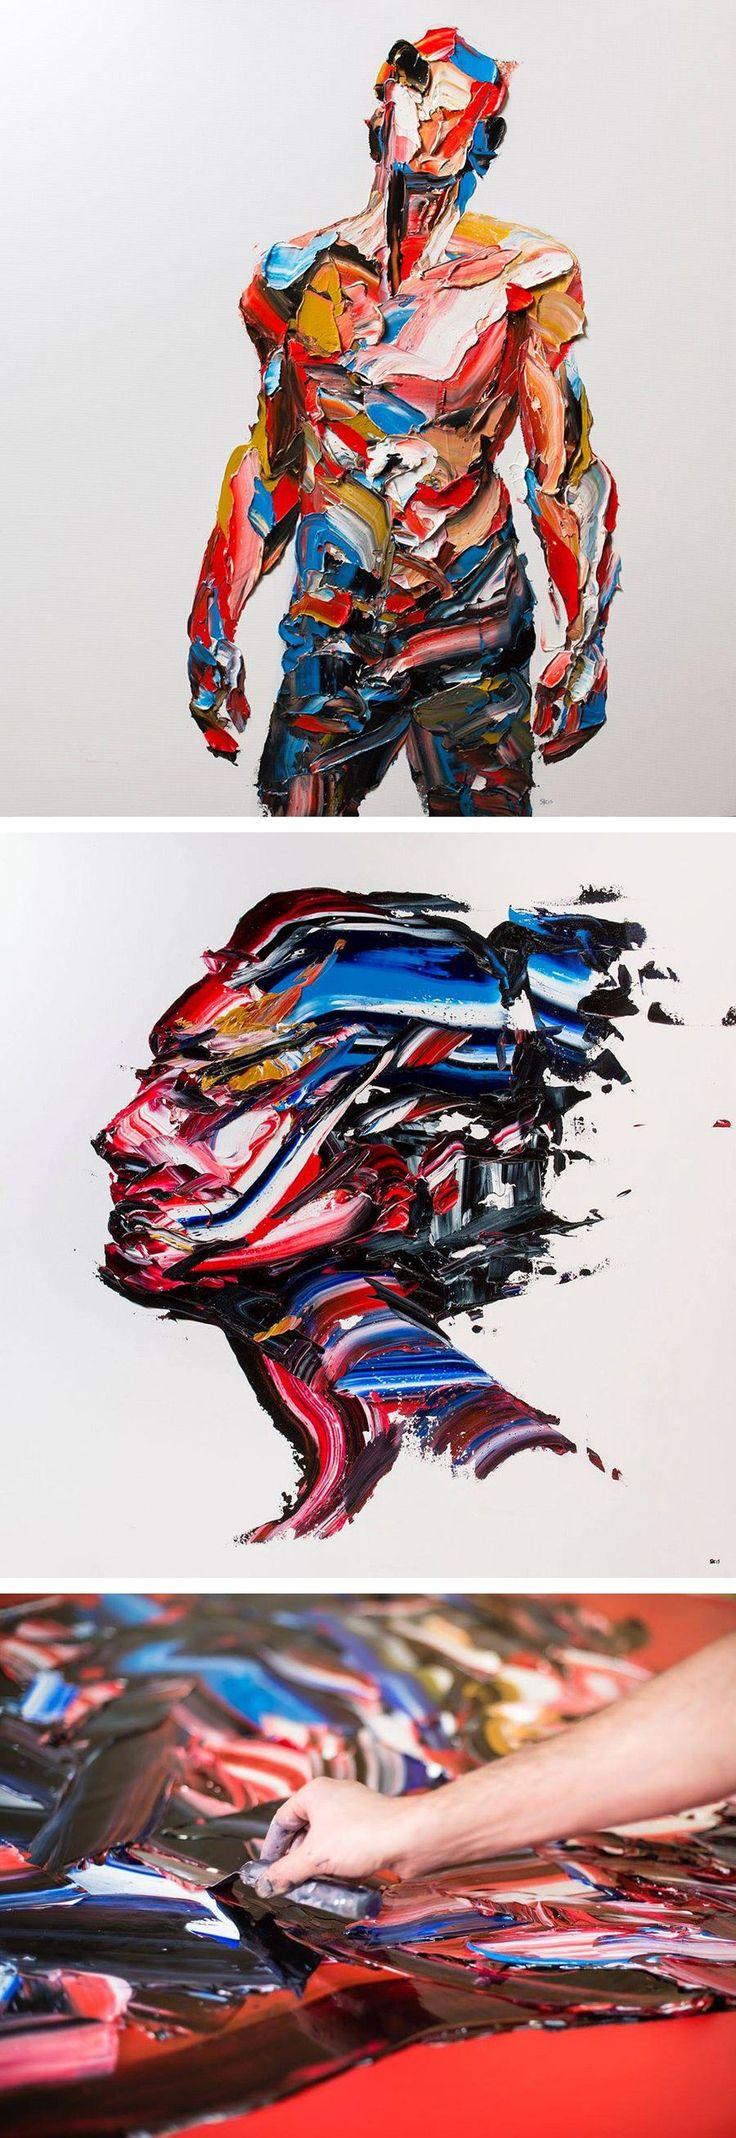 Enormous Palette Knife Portraits and Figures by Salman Khoshroo  • pinterest & instagram - @ninabubblygum •